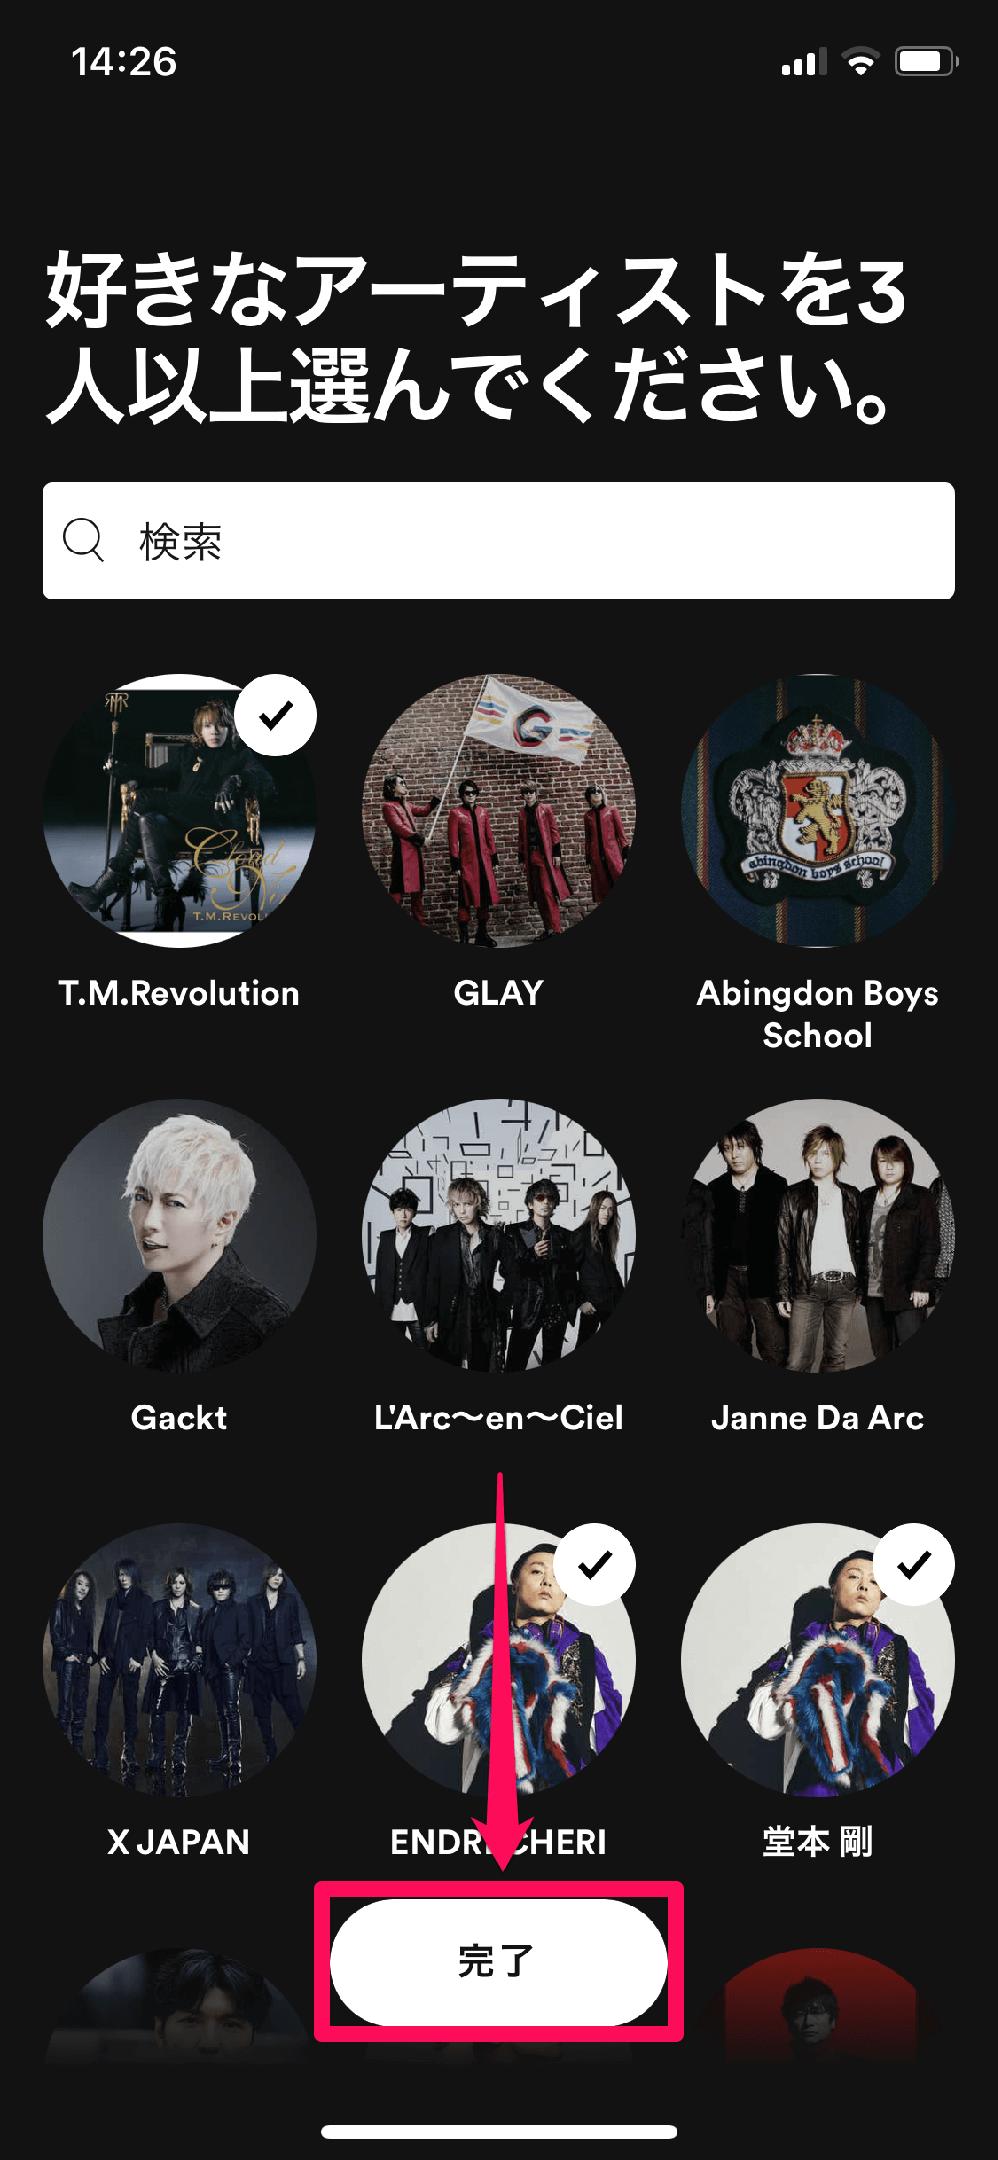 Spotifyのアカウントを作成する方法。無料で音楽を聴くのに便利!